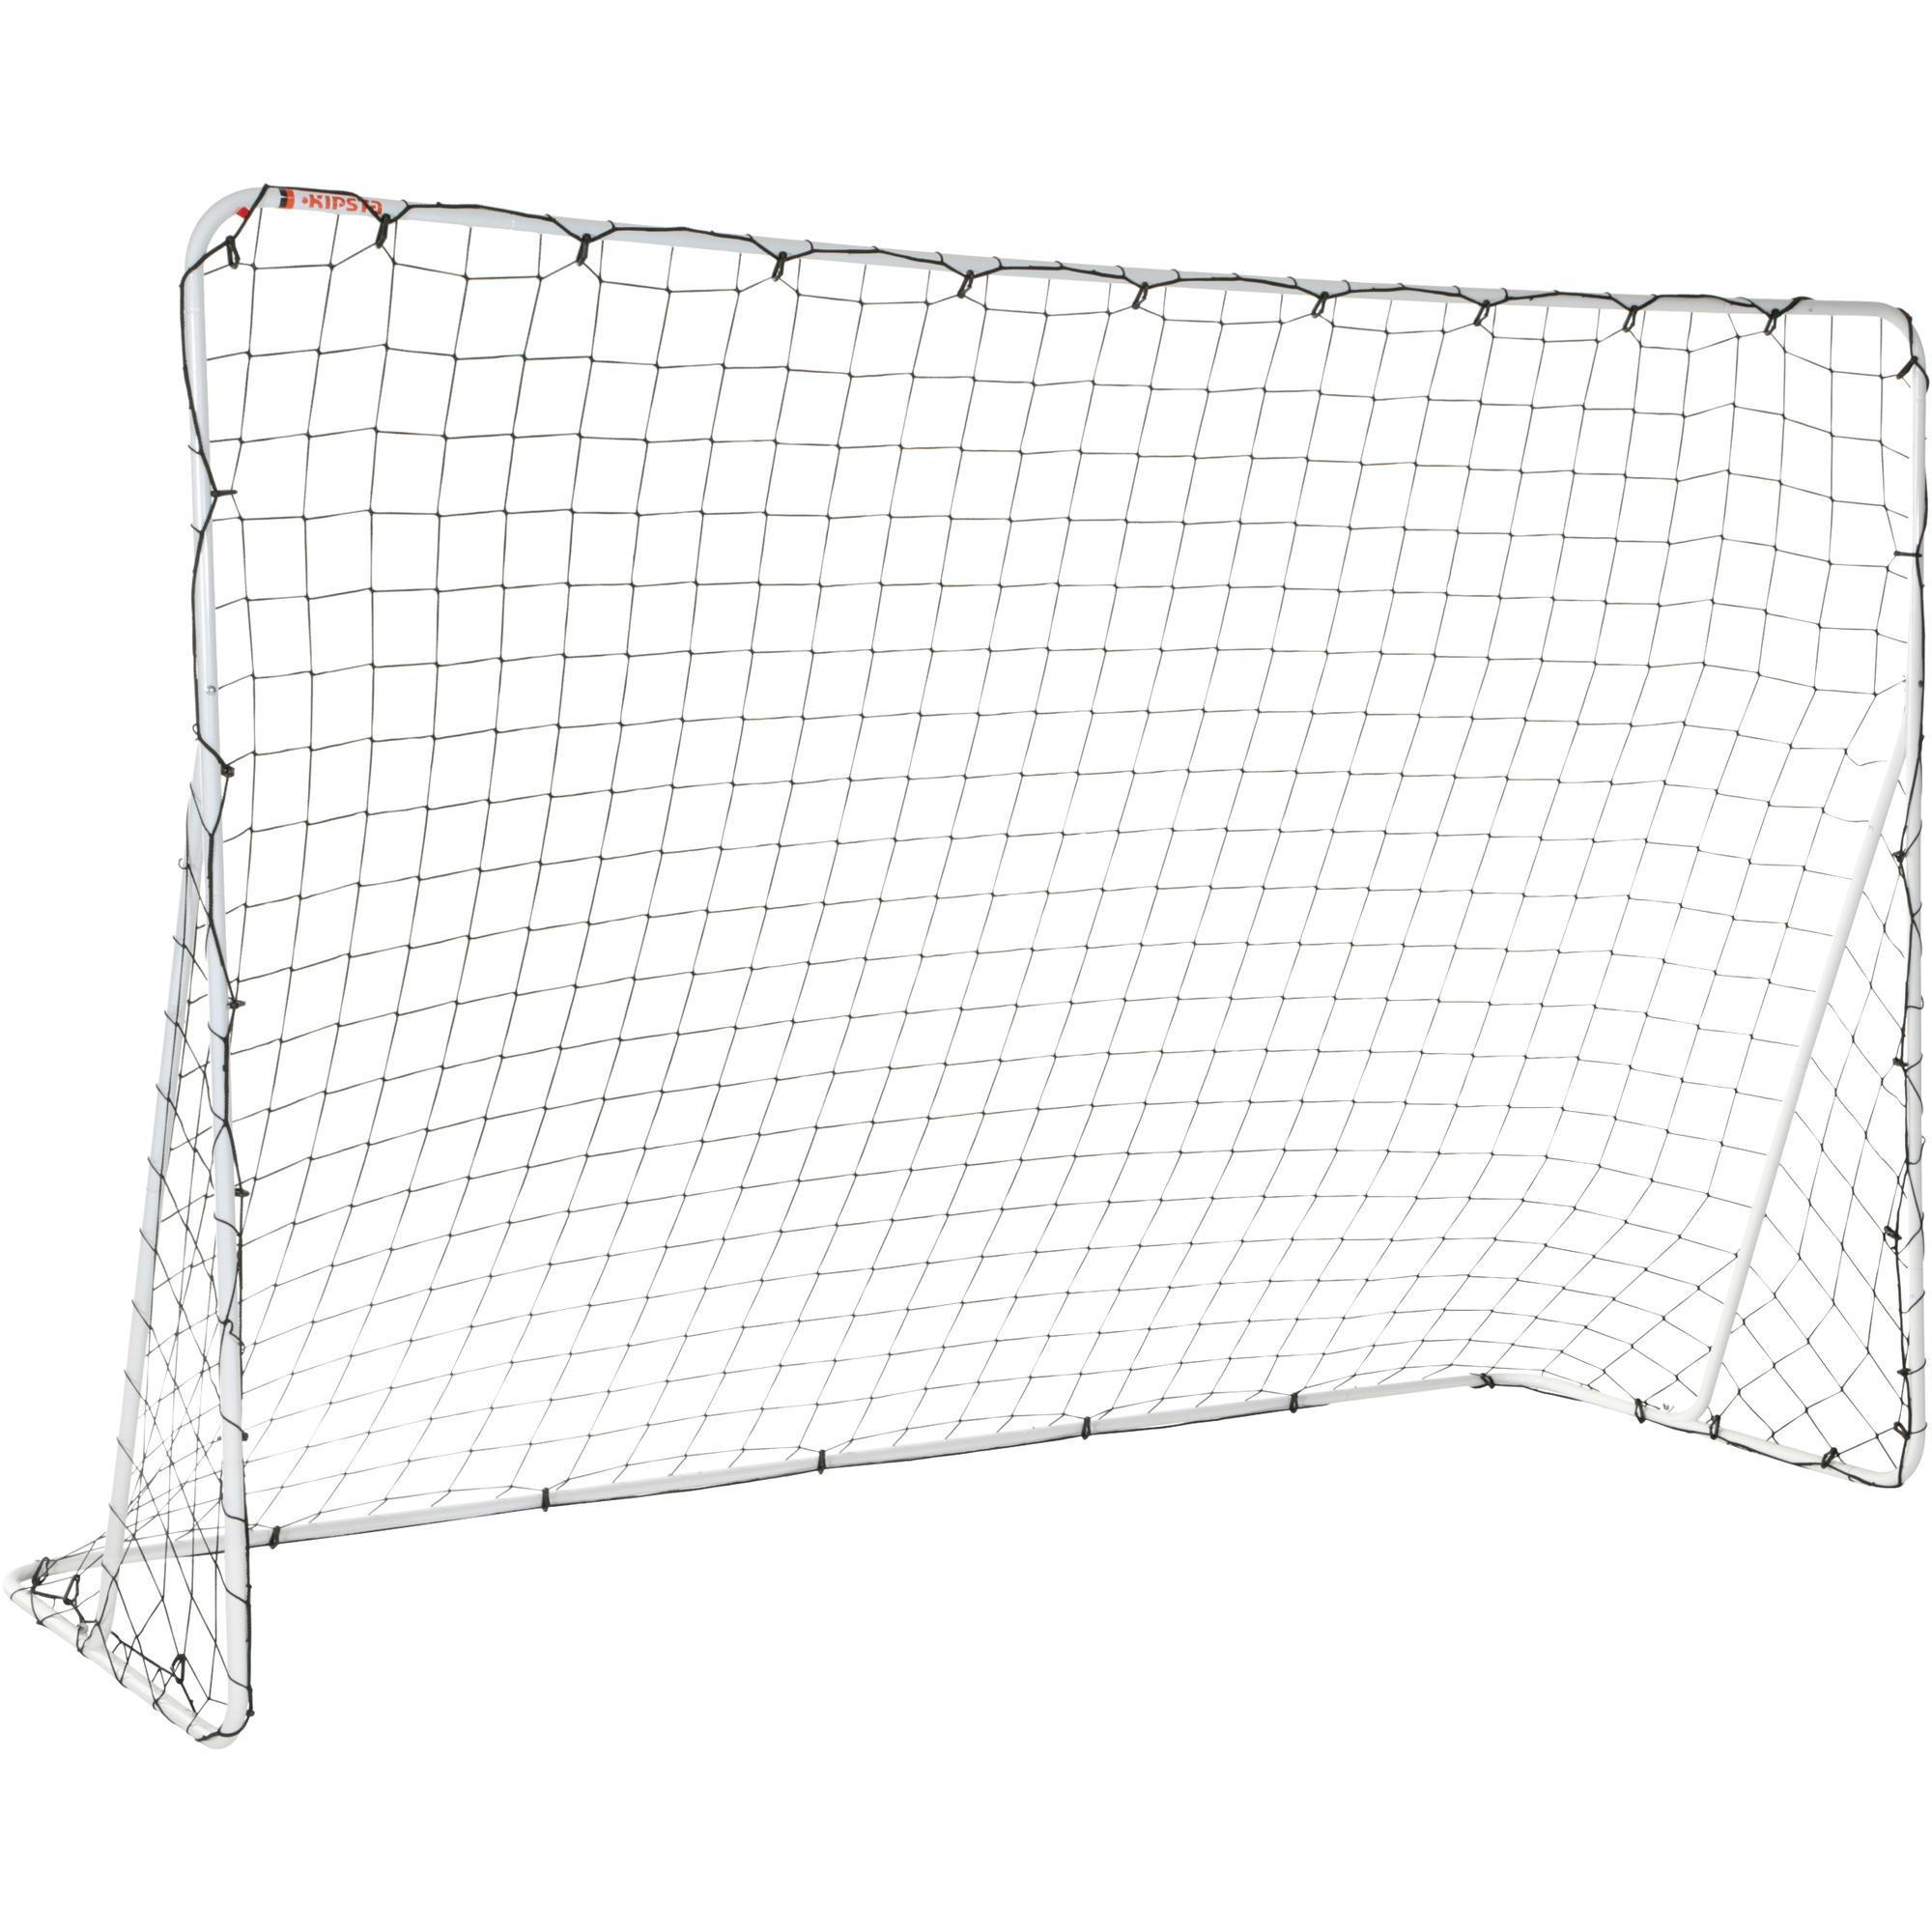 Kipsta Voetbaldoel Basic Goal FGO 100 maat L 3x2 m wit